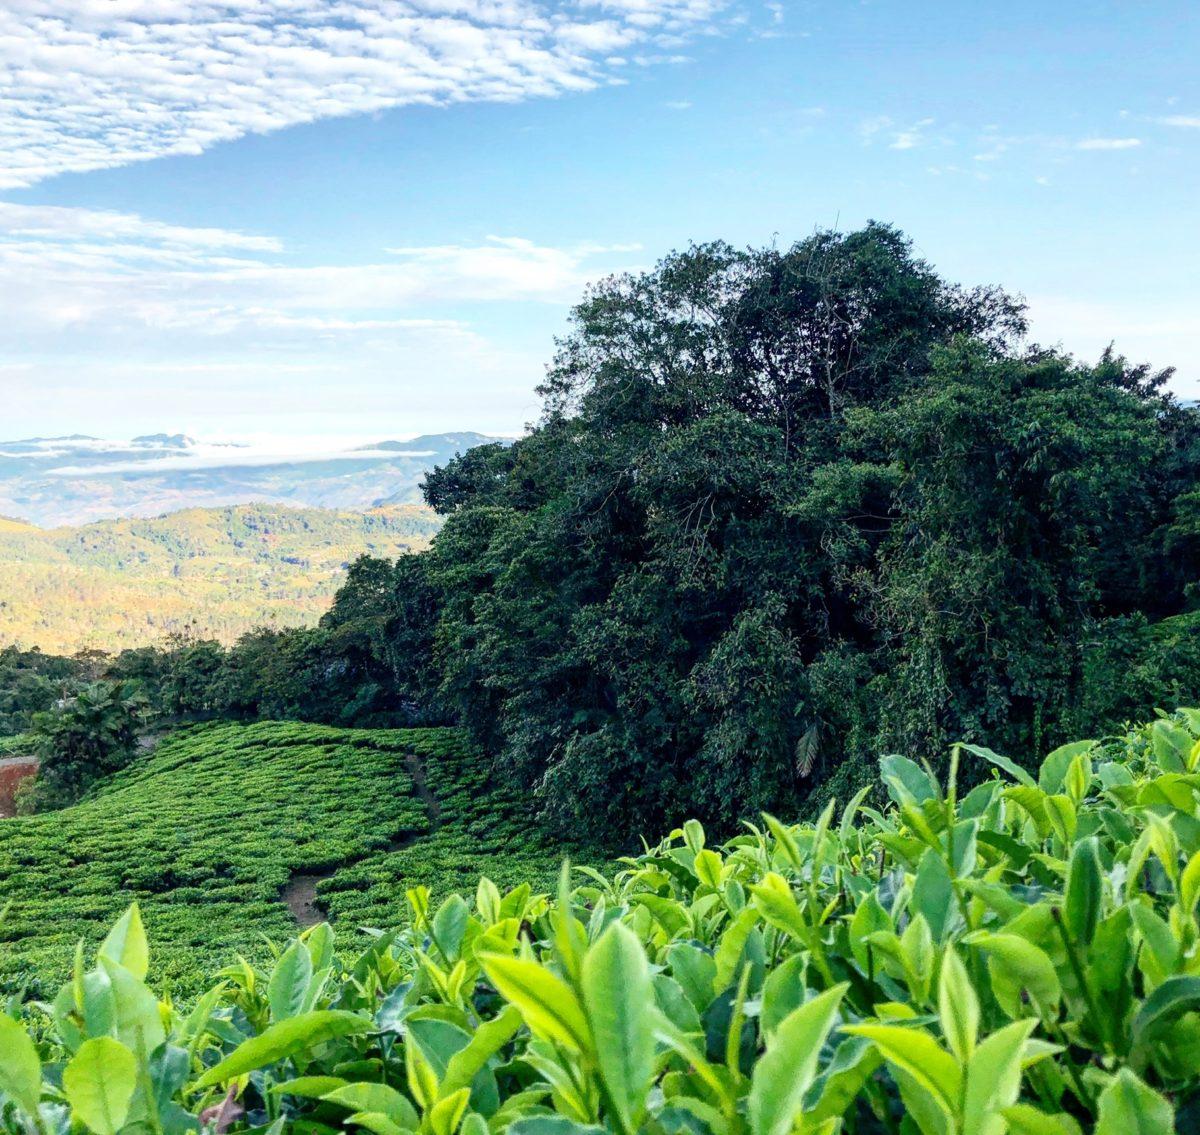 Bitaco finances reforestation providing 30,000-40,000 native trees annually.